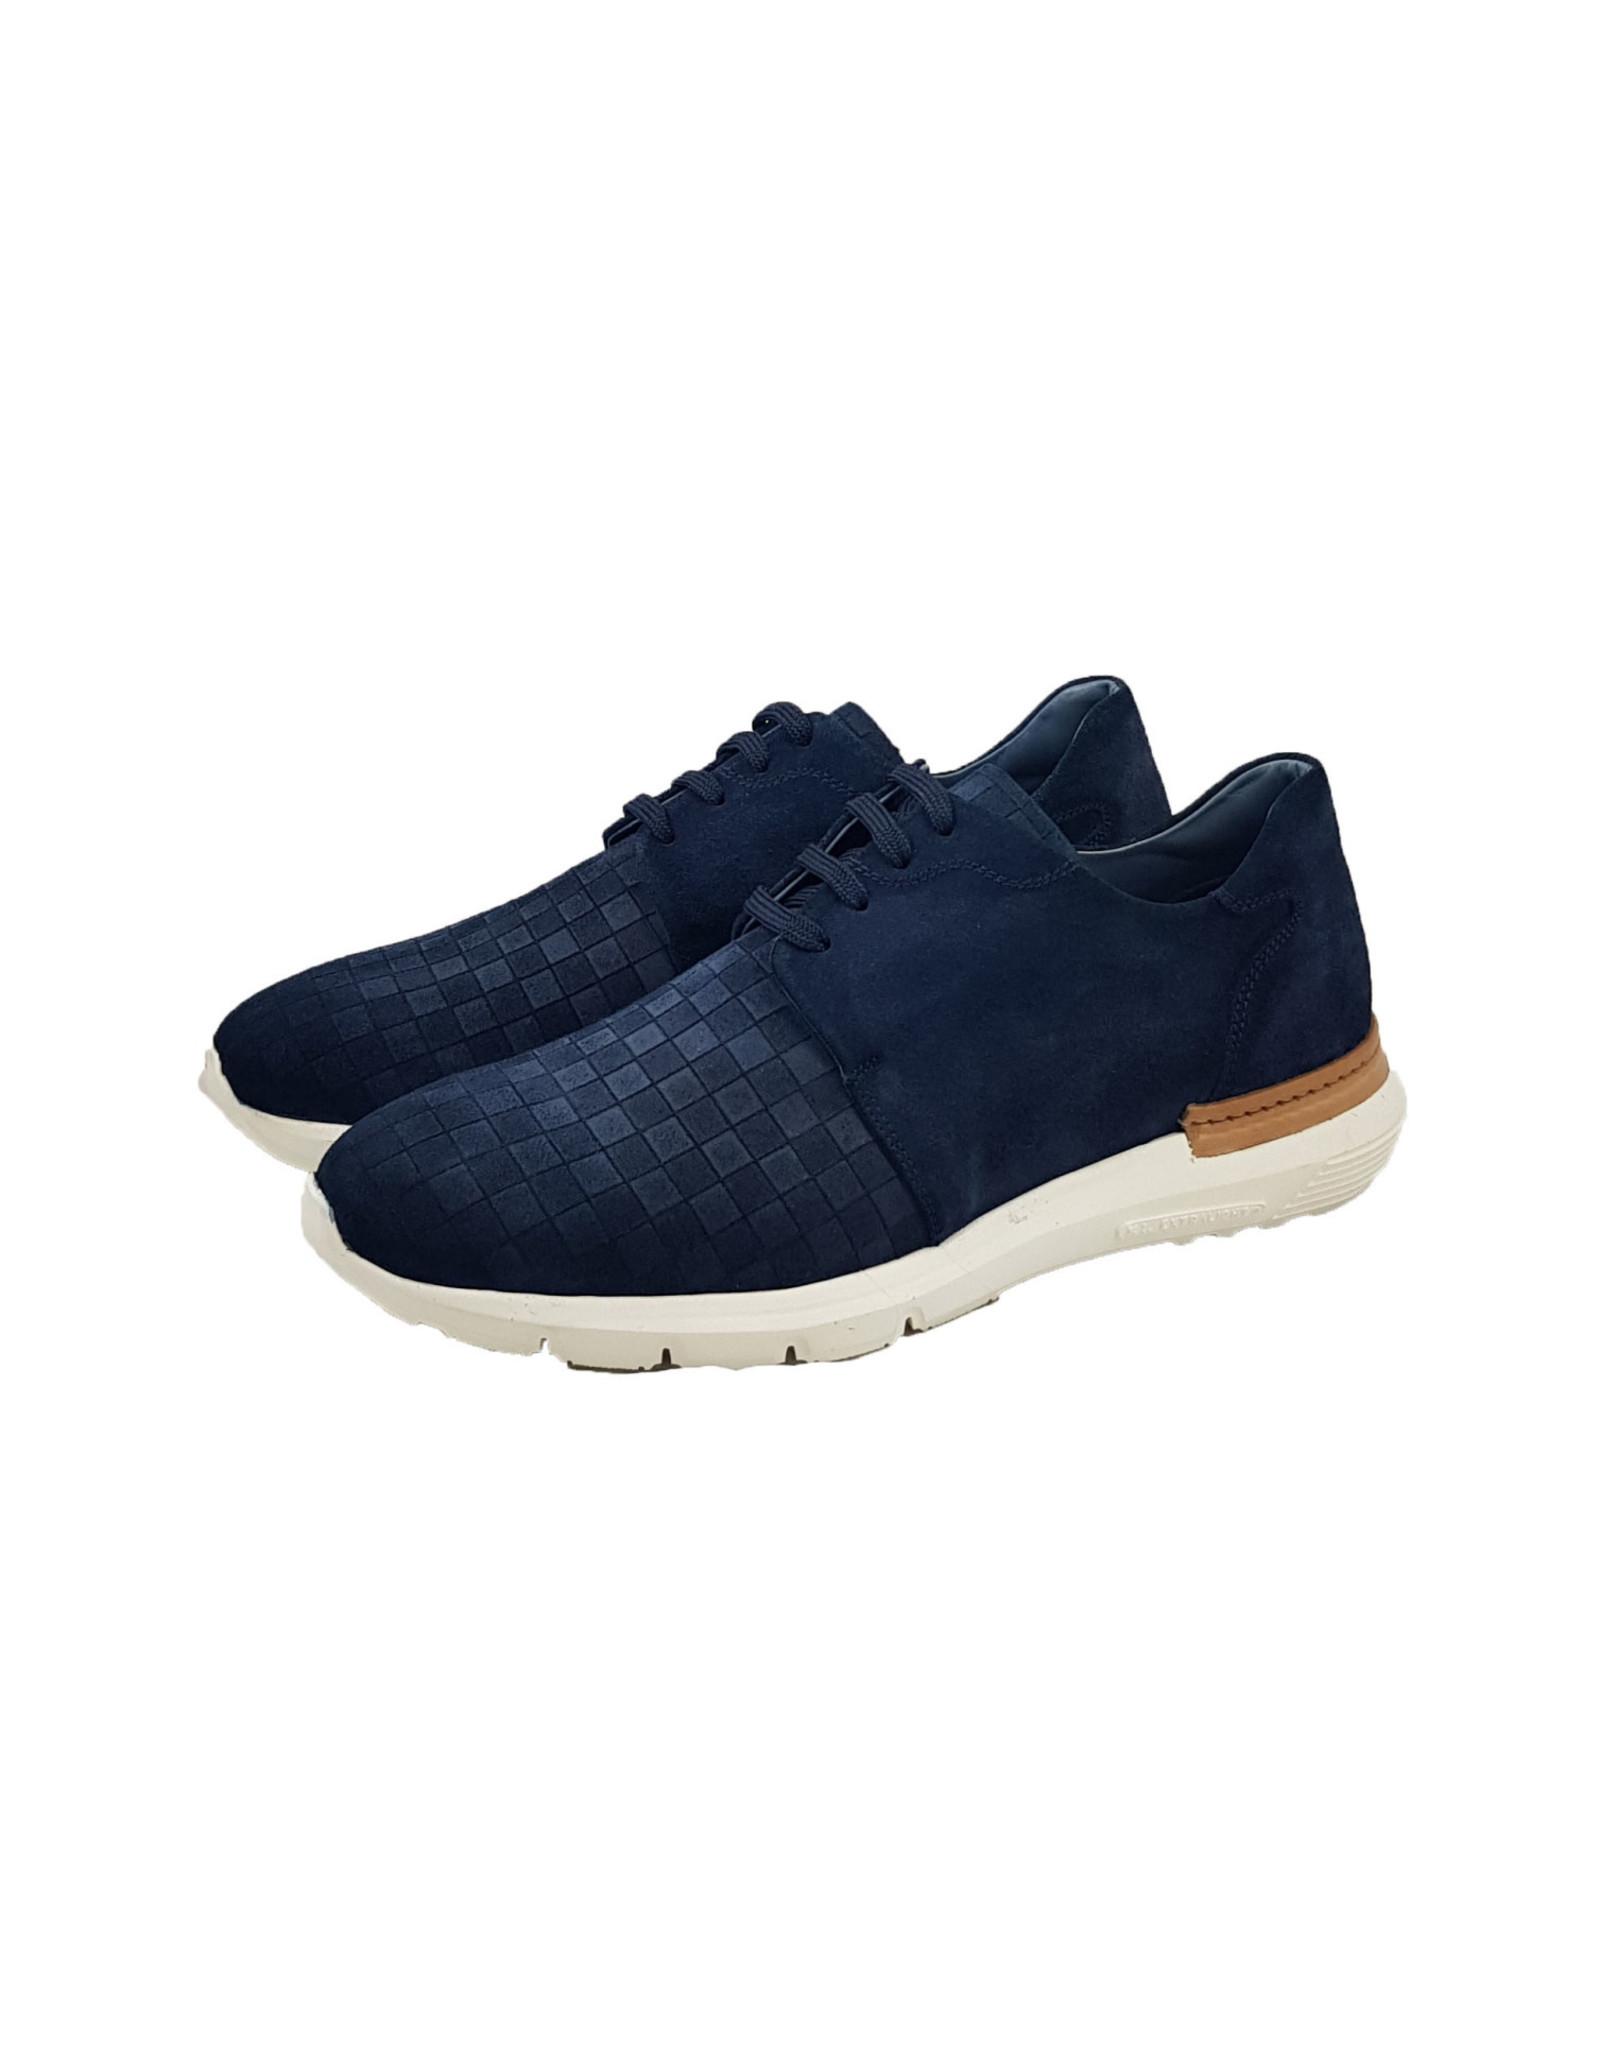 Zampiere Zampiere schoenen blauw Circle blue M:6148 V18